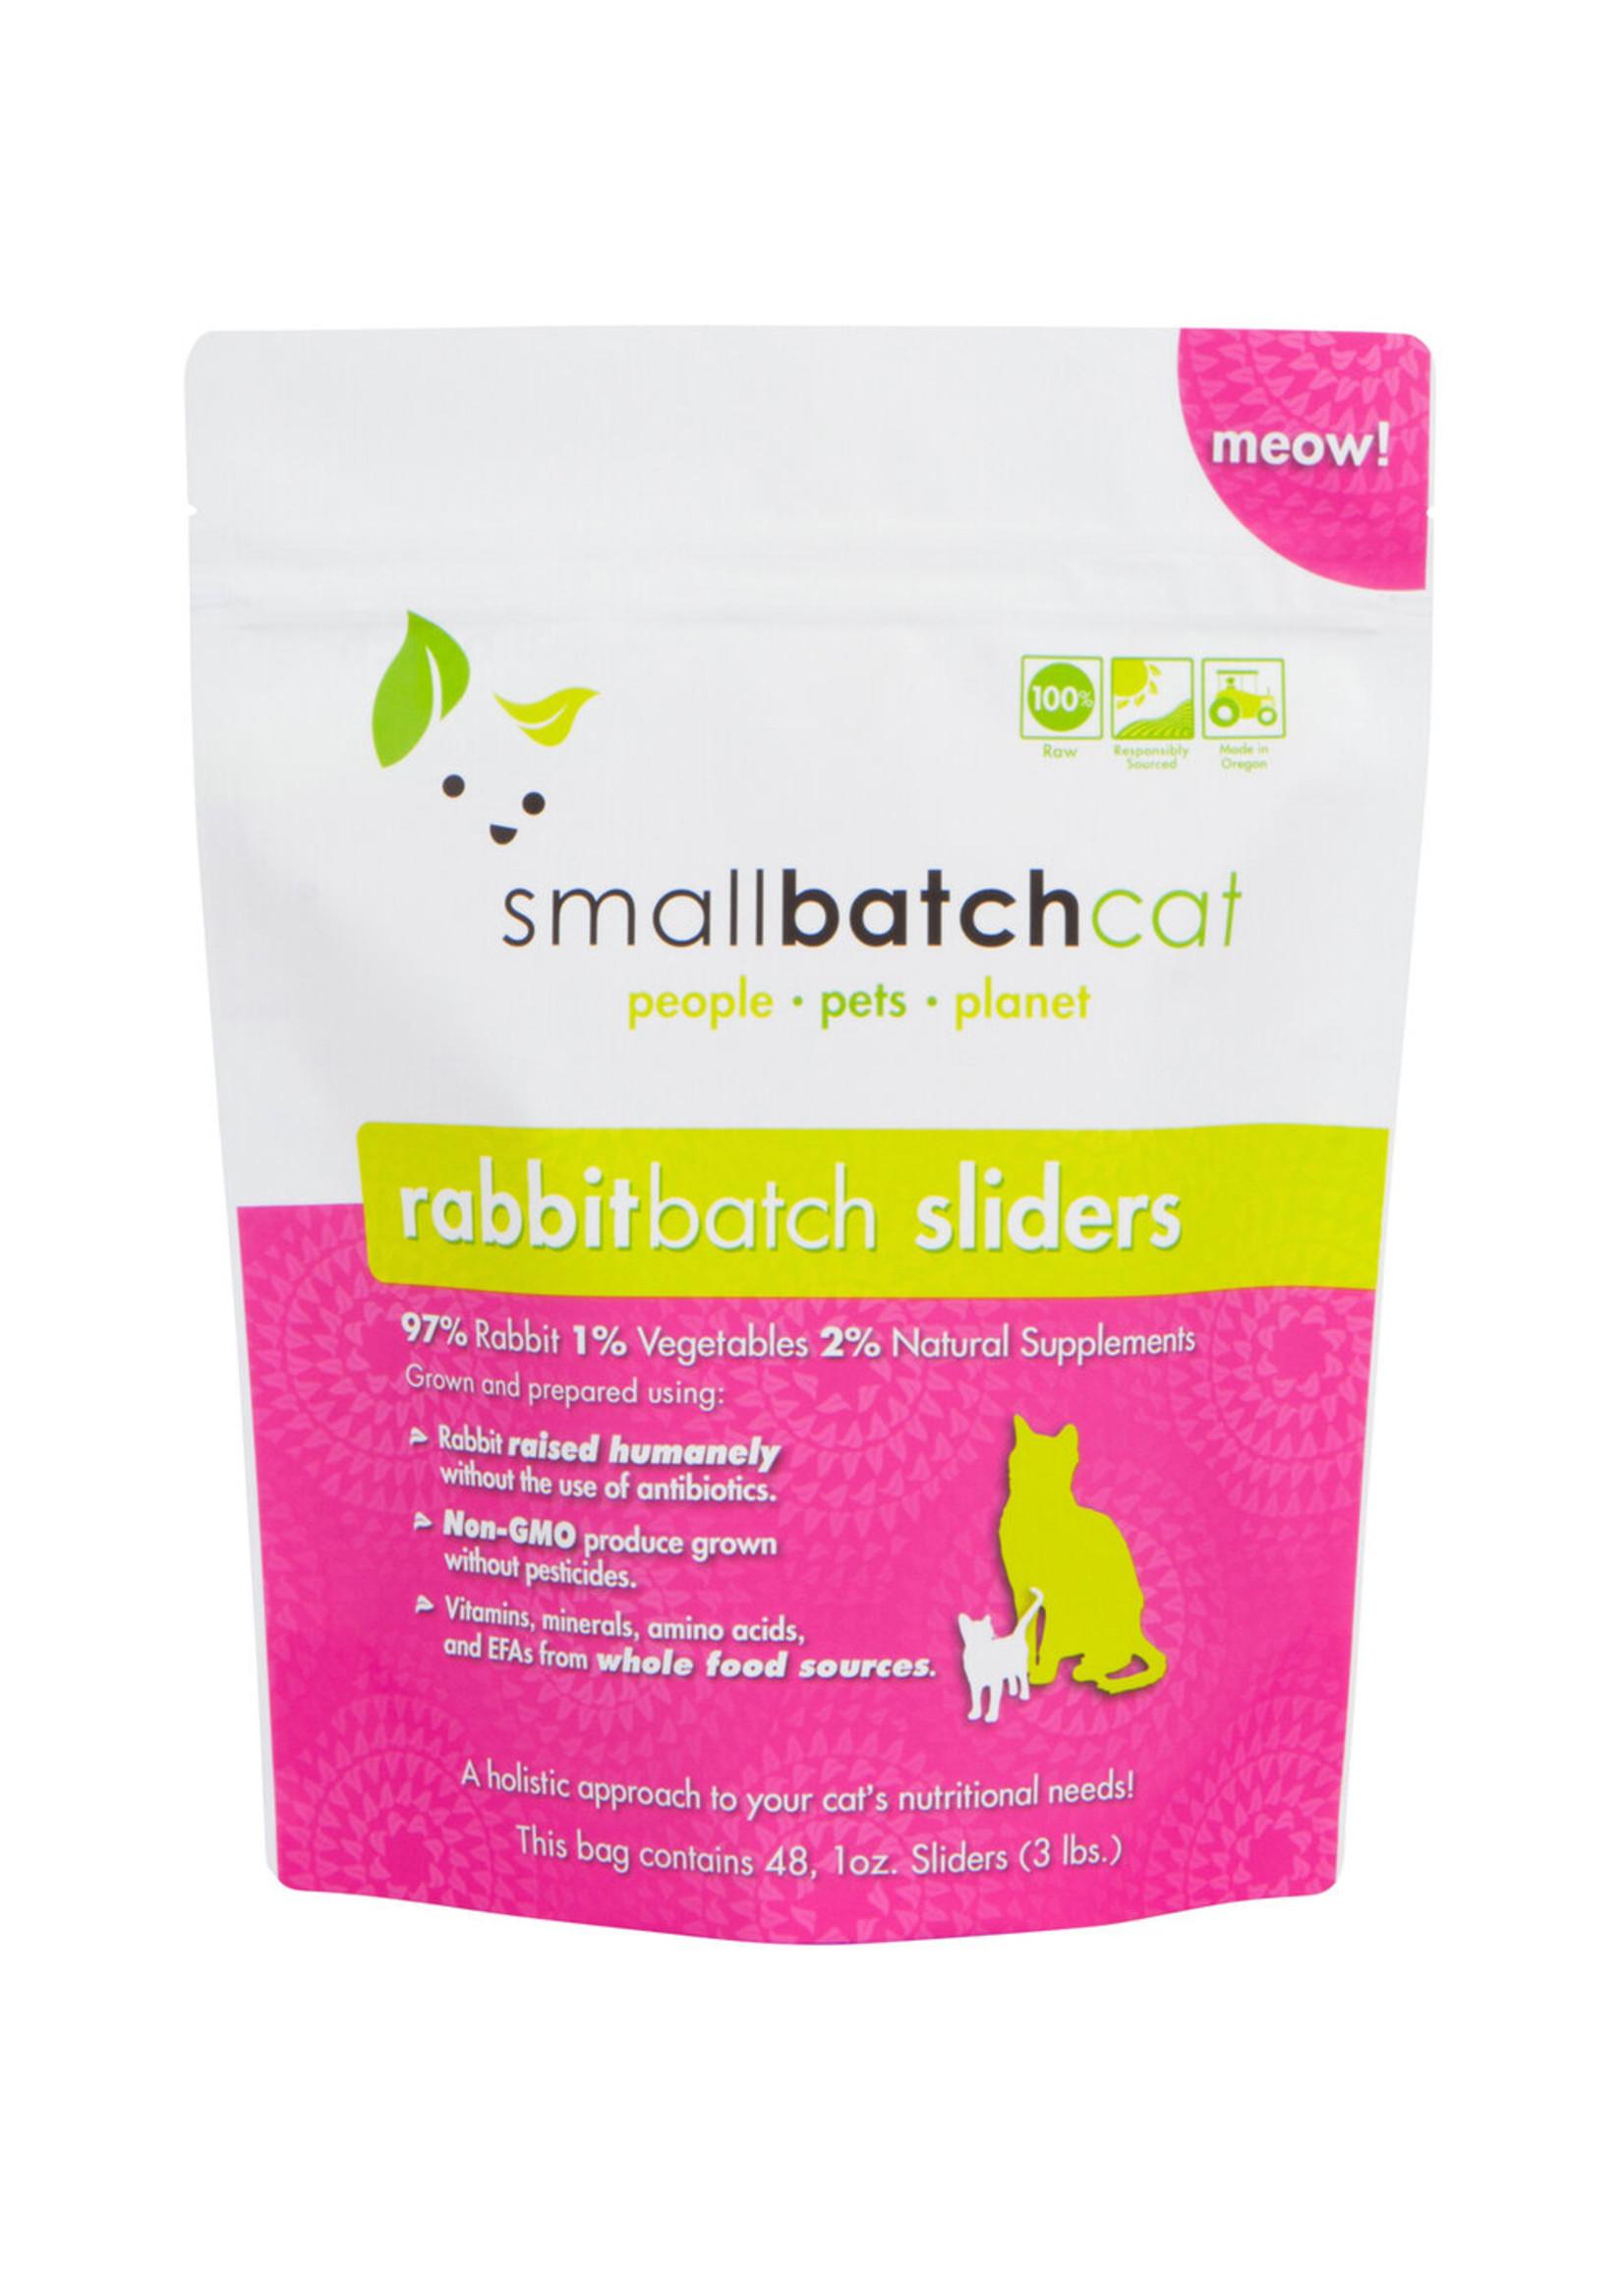 SMALL BATCH Small Batch Cat Rabbit Sliders, 3 lb.